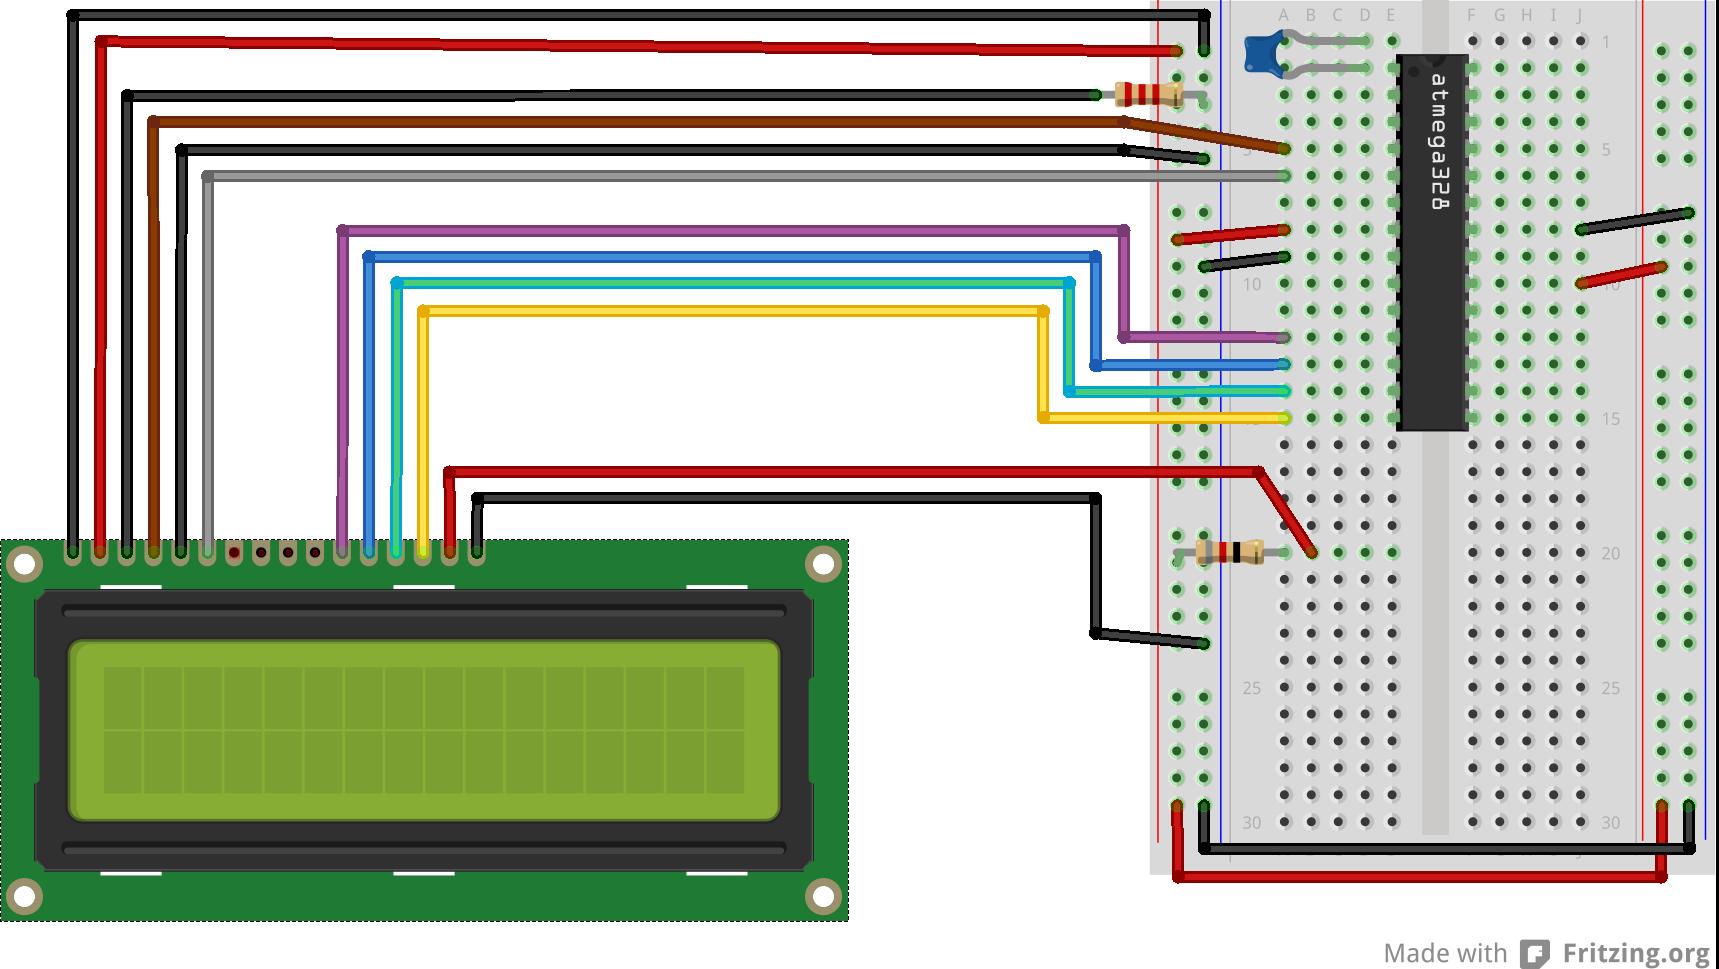 Câblage LCD vers ATmega328p